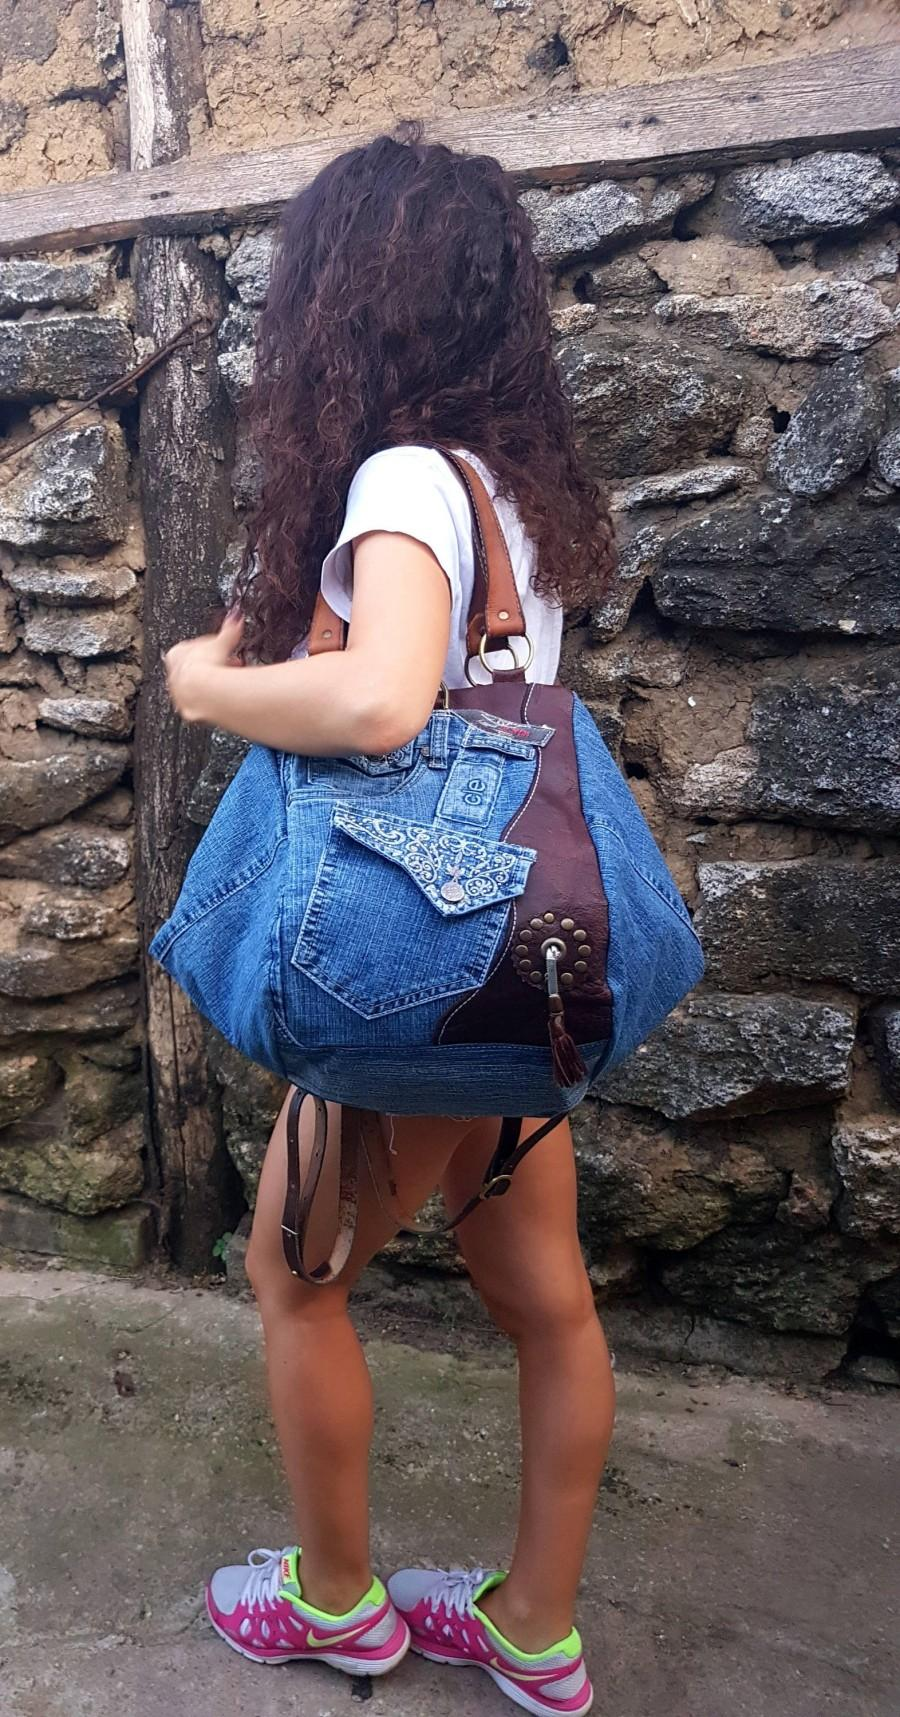 Hochzeit - Leather Carry Bag, Leather Tote Bag, Duffel Bag, Weekend Bag, Travel Bag, Denim Backpack, Leather Backpack, Holiday Bag, Leather Travel Bag